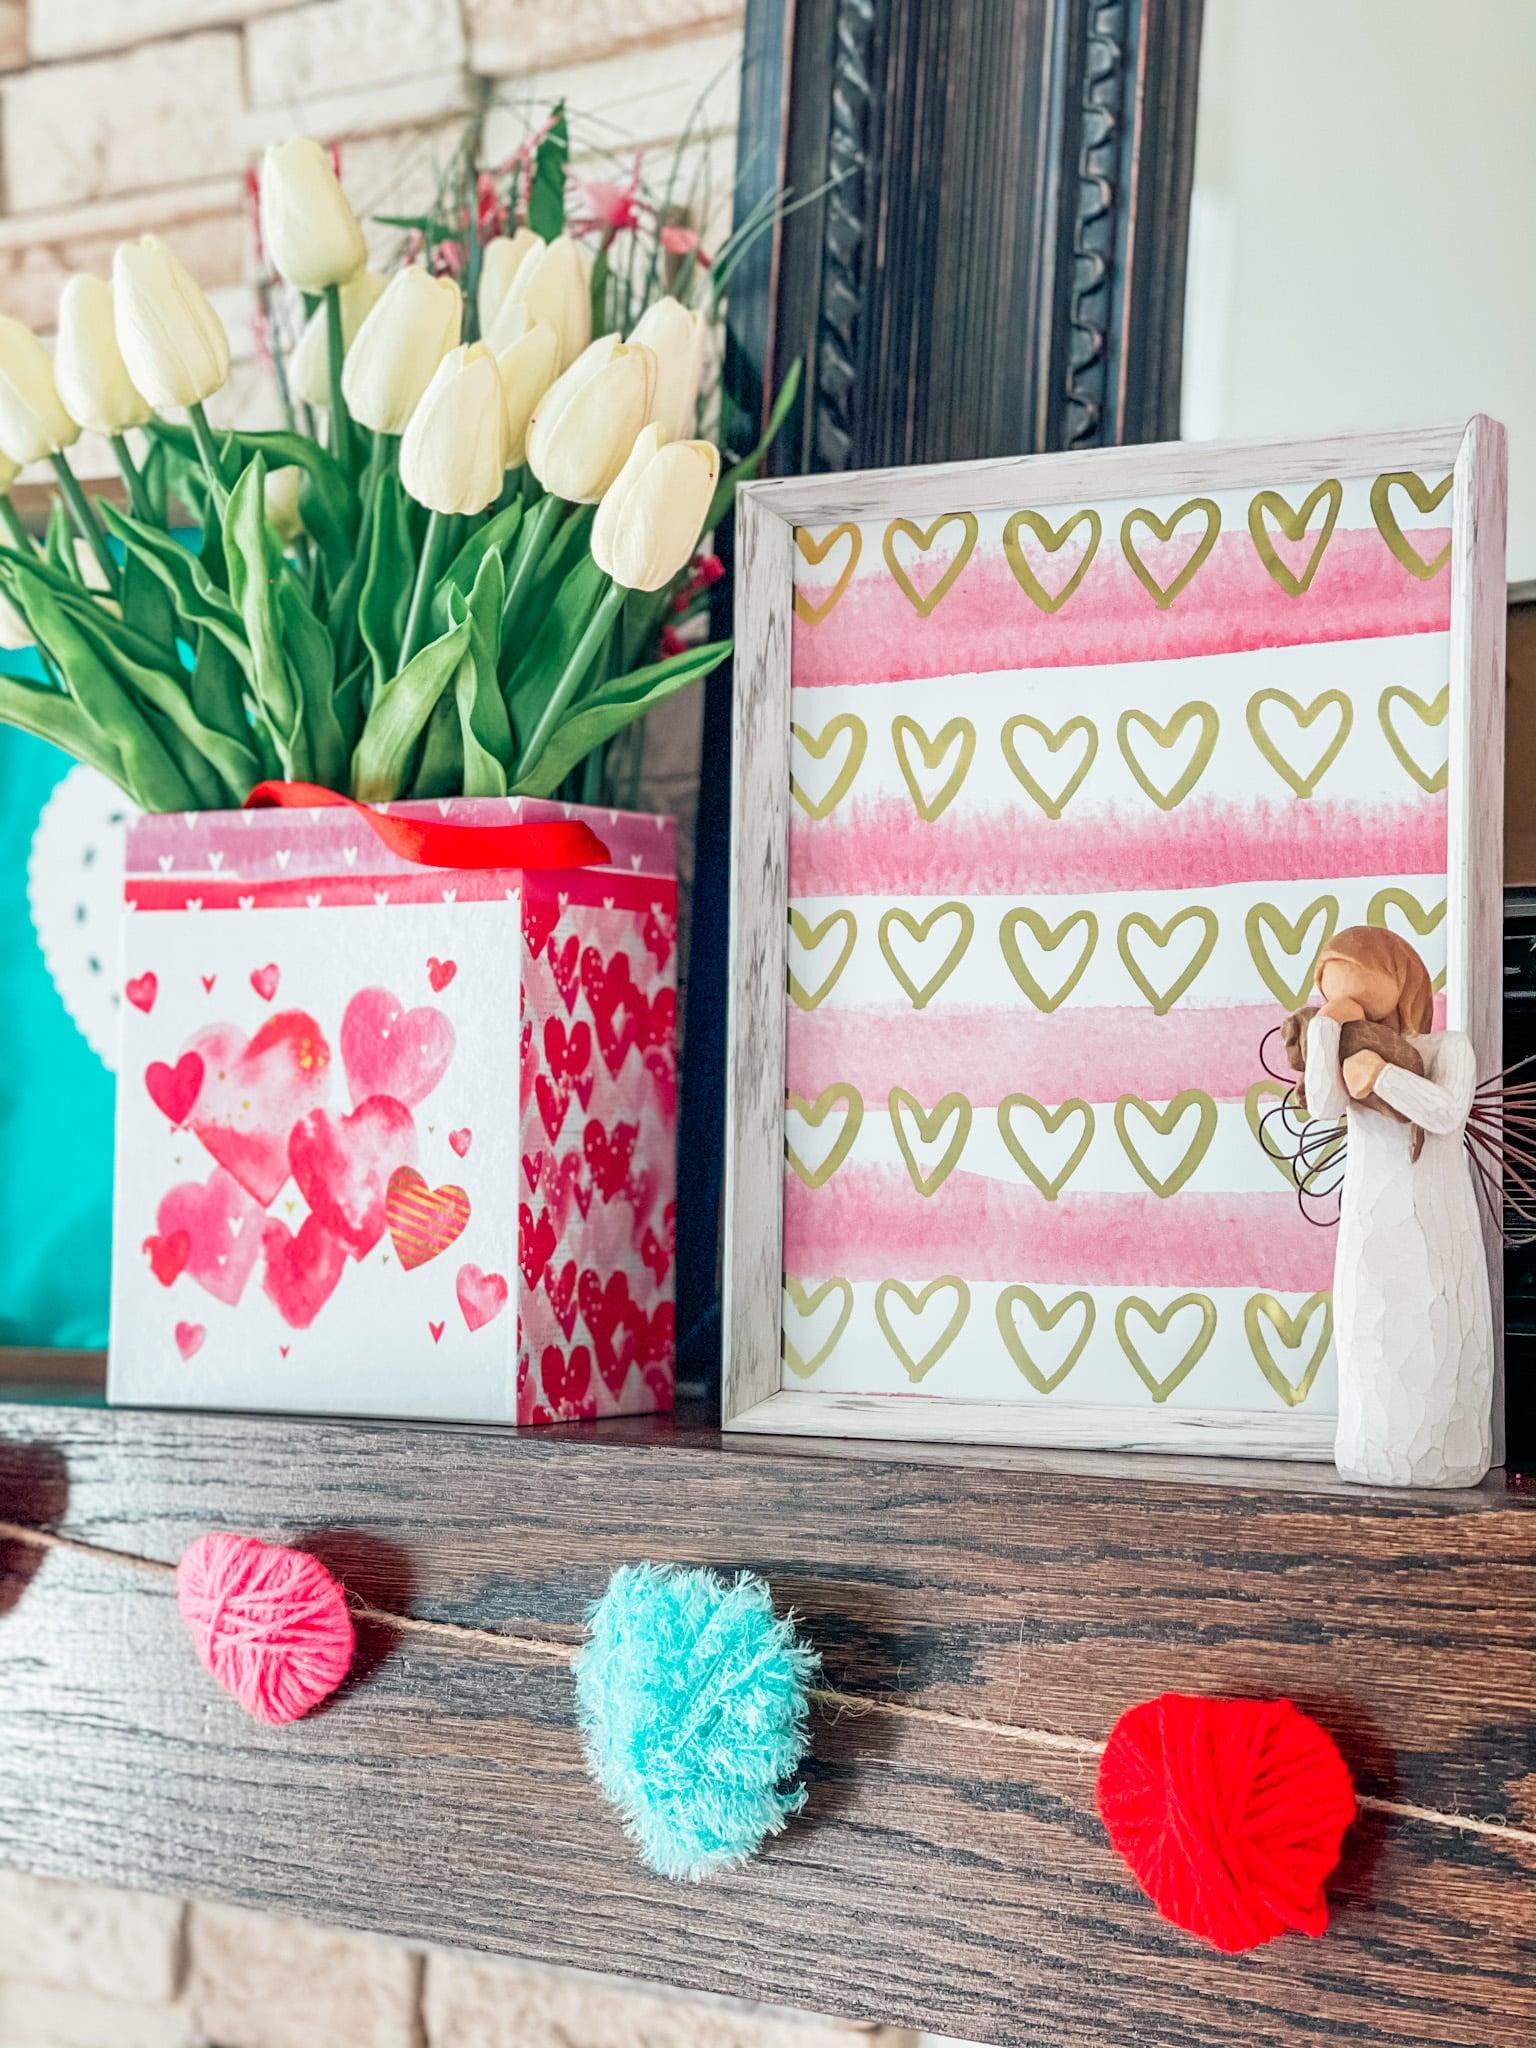 Valentine's Day decorations on a fireplace